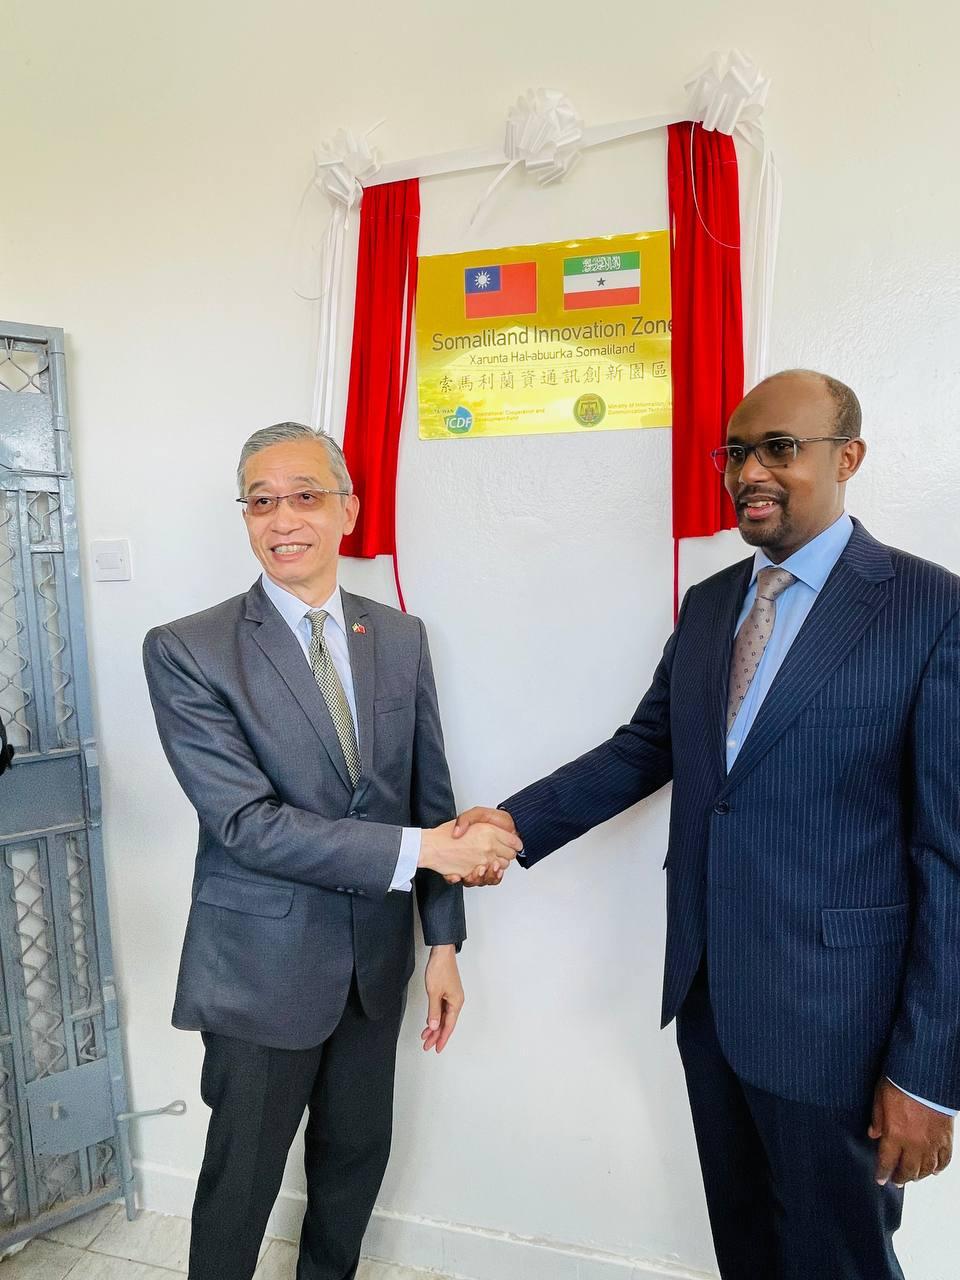 Somaliland Innovation Zone Opens